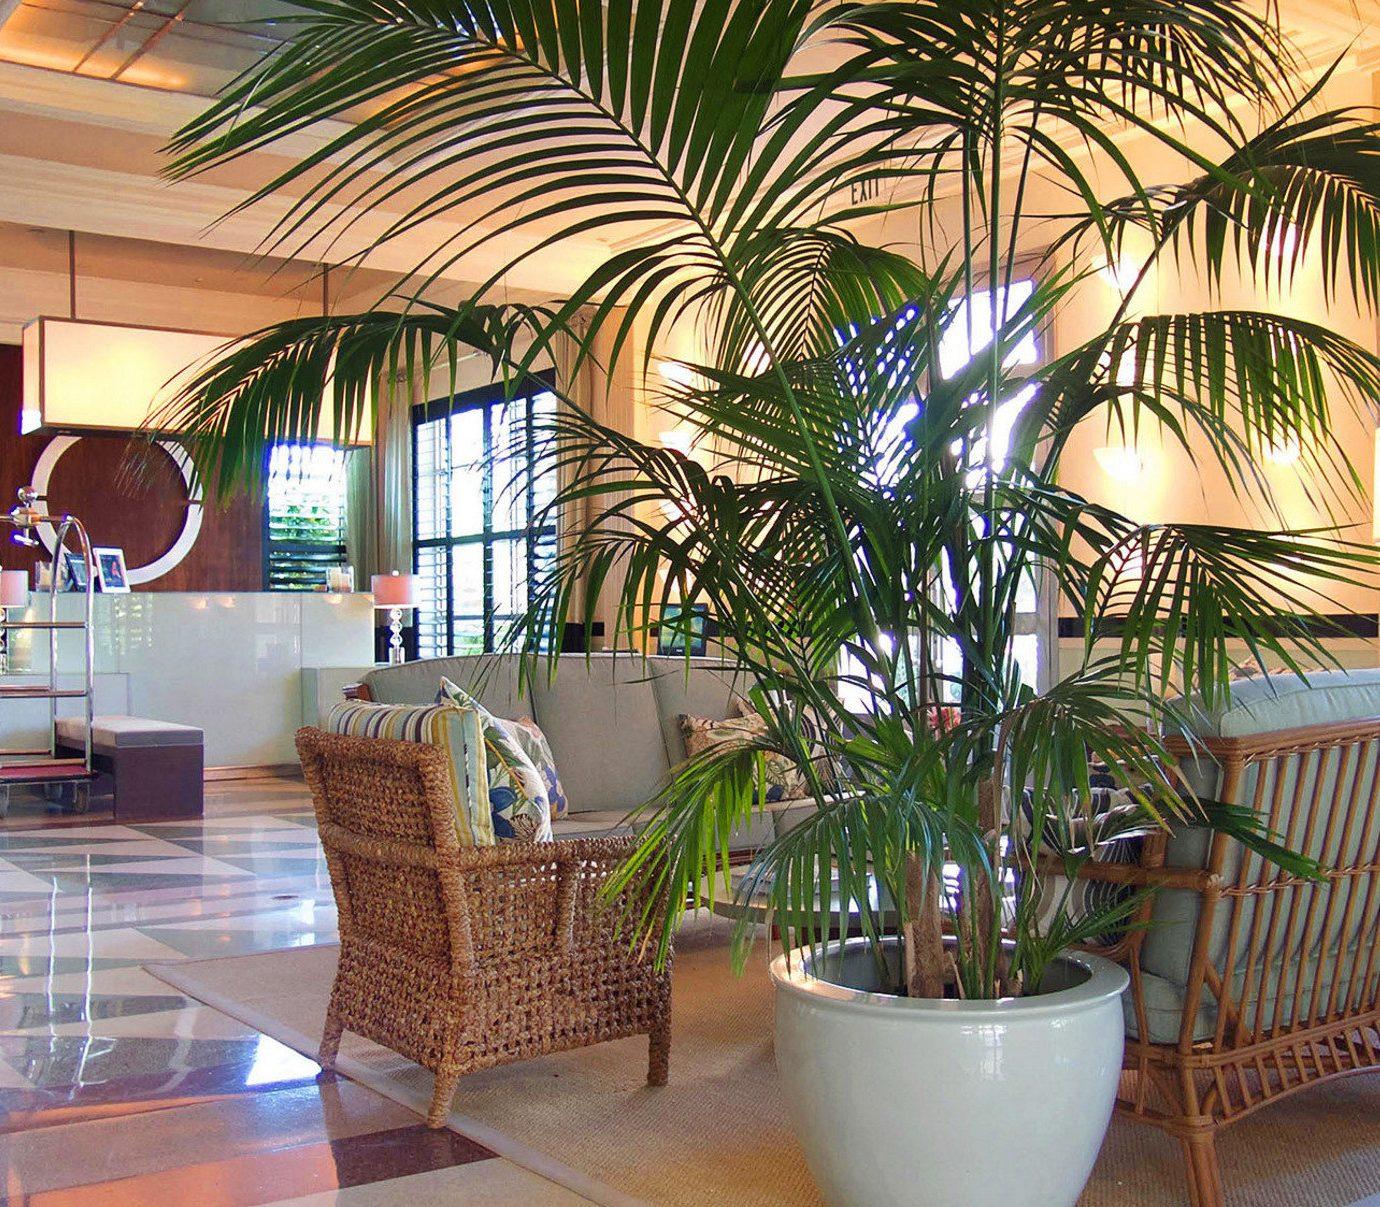 Lobby property condominium plant Resort home restaurant living room Villa Dining arecales tree